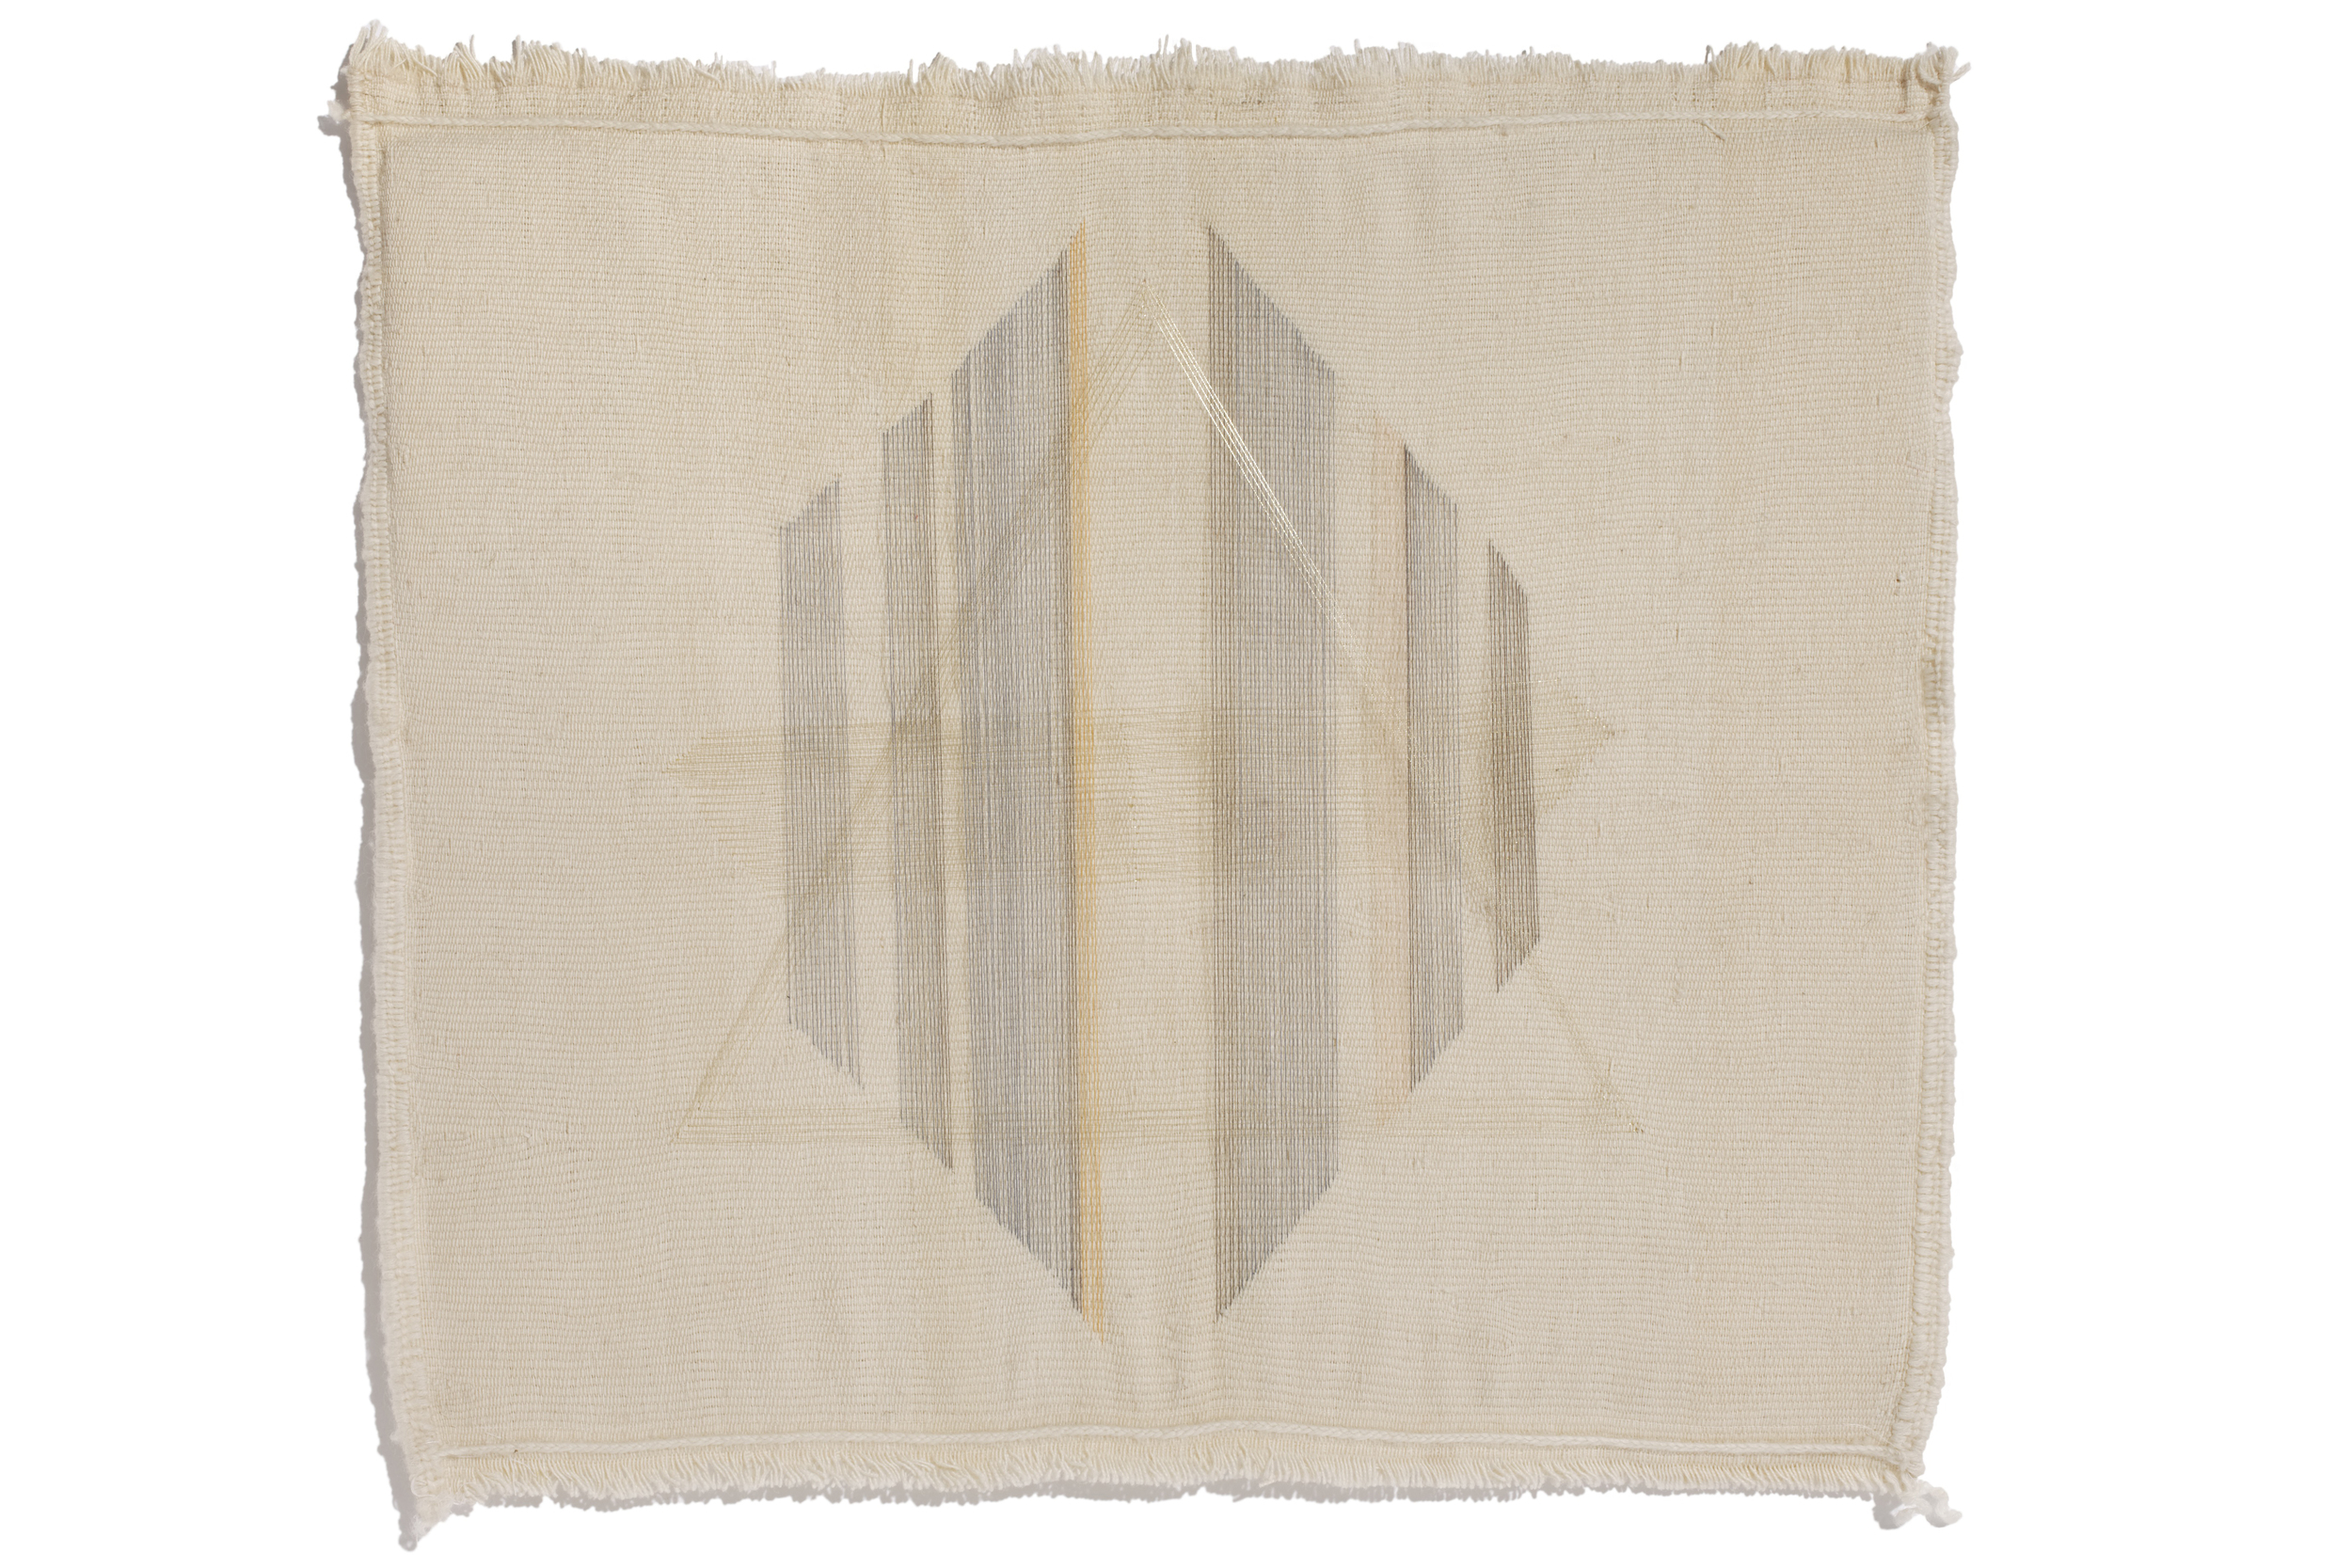 Haleh Redjaian  Untitled , 2015 thread on hand woven textile, 75 x 75 x 8 cm framed